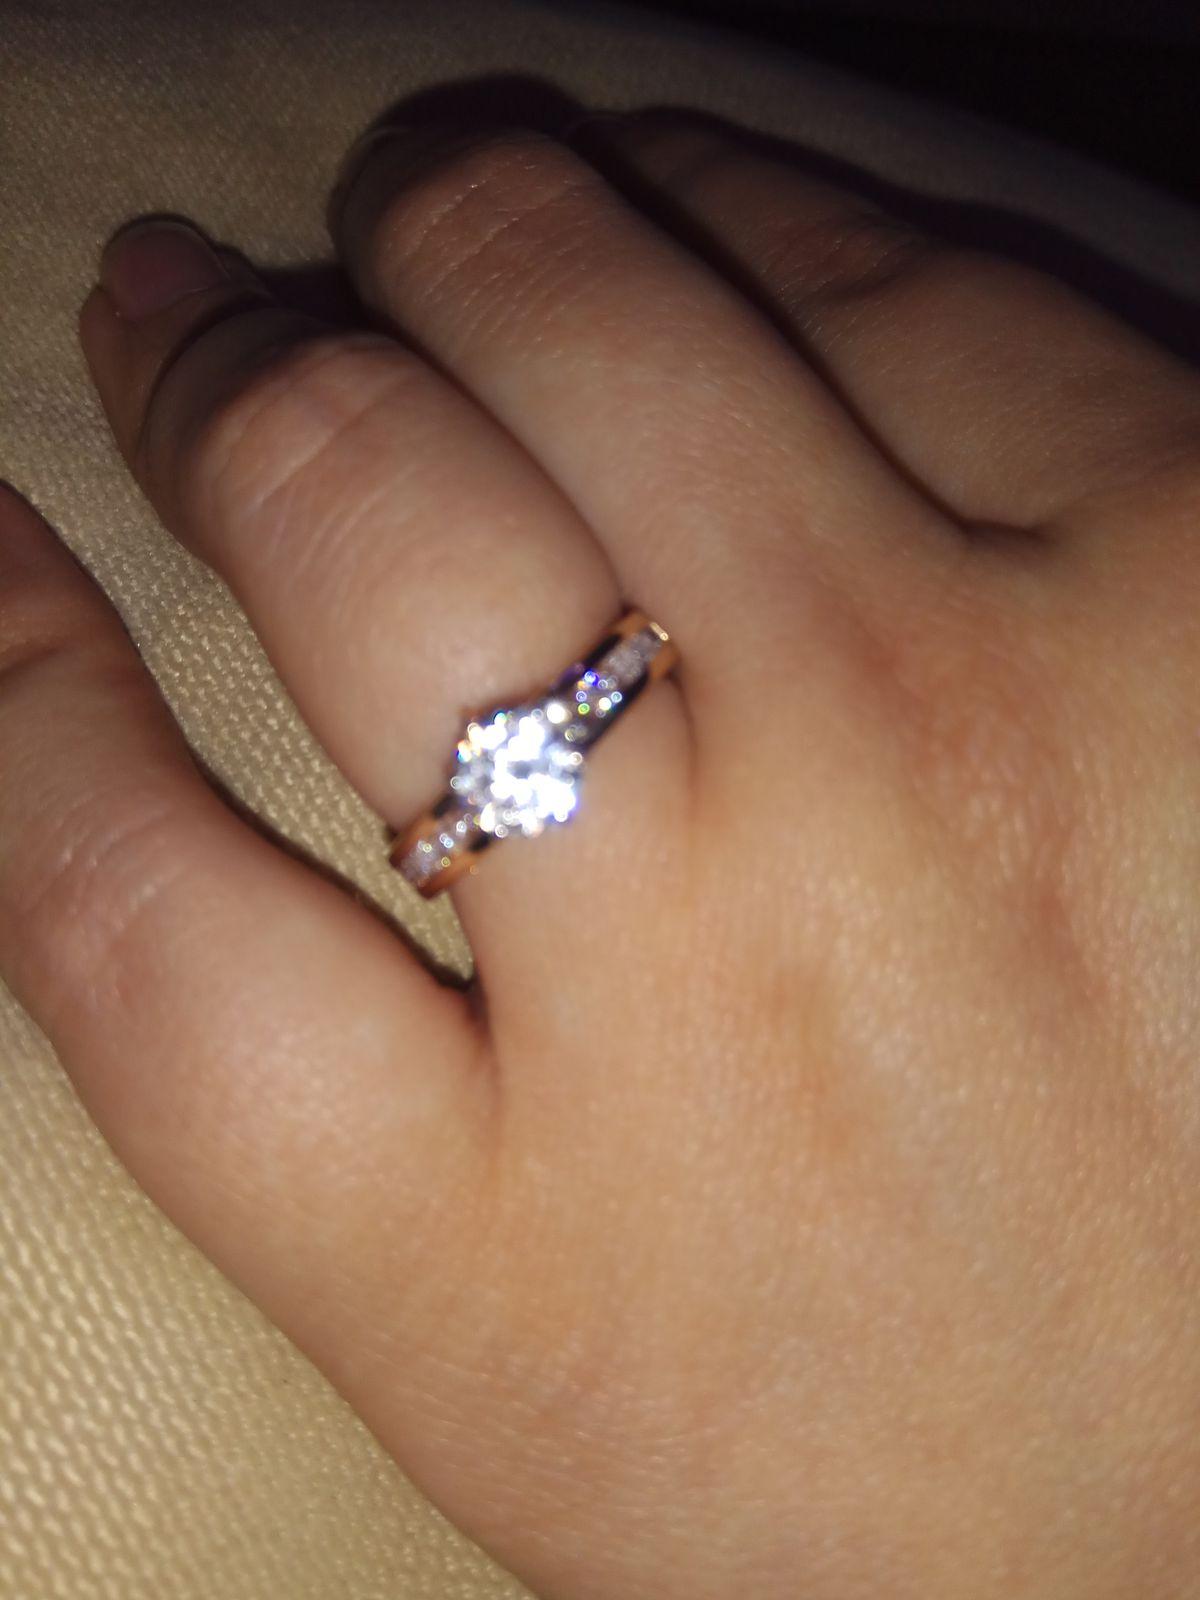 Яркое кольцо для яркой девушки